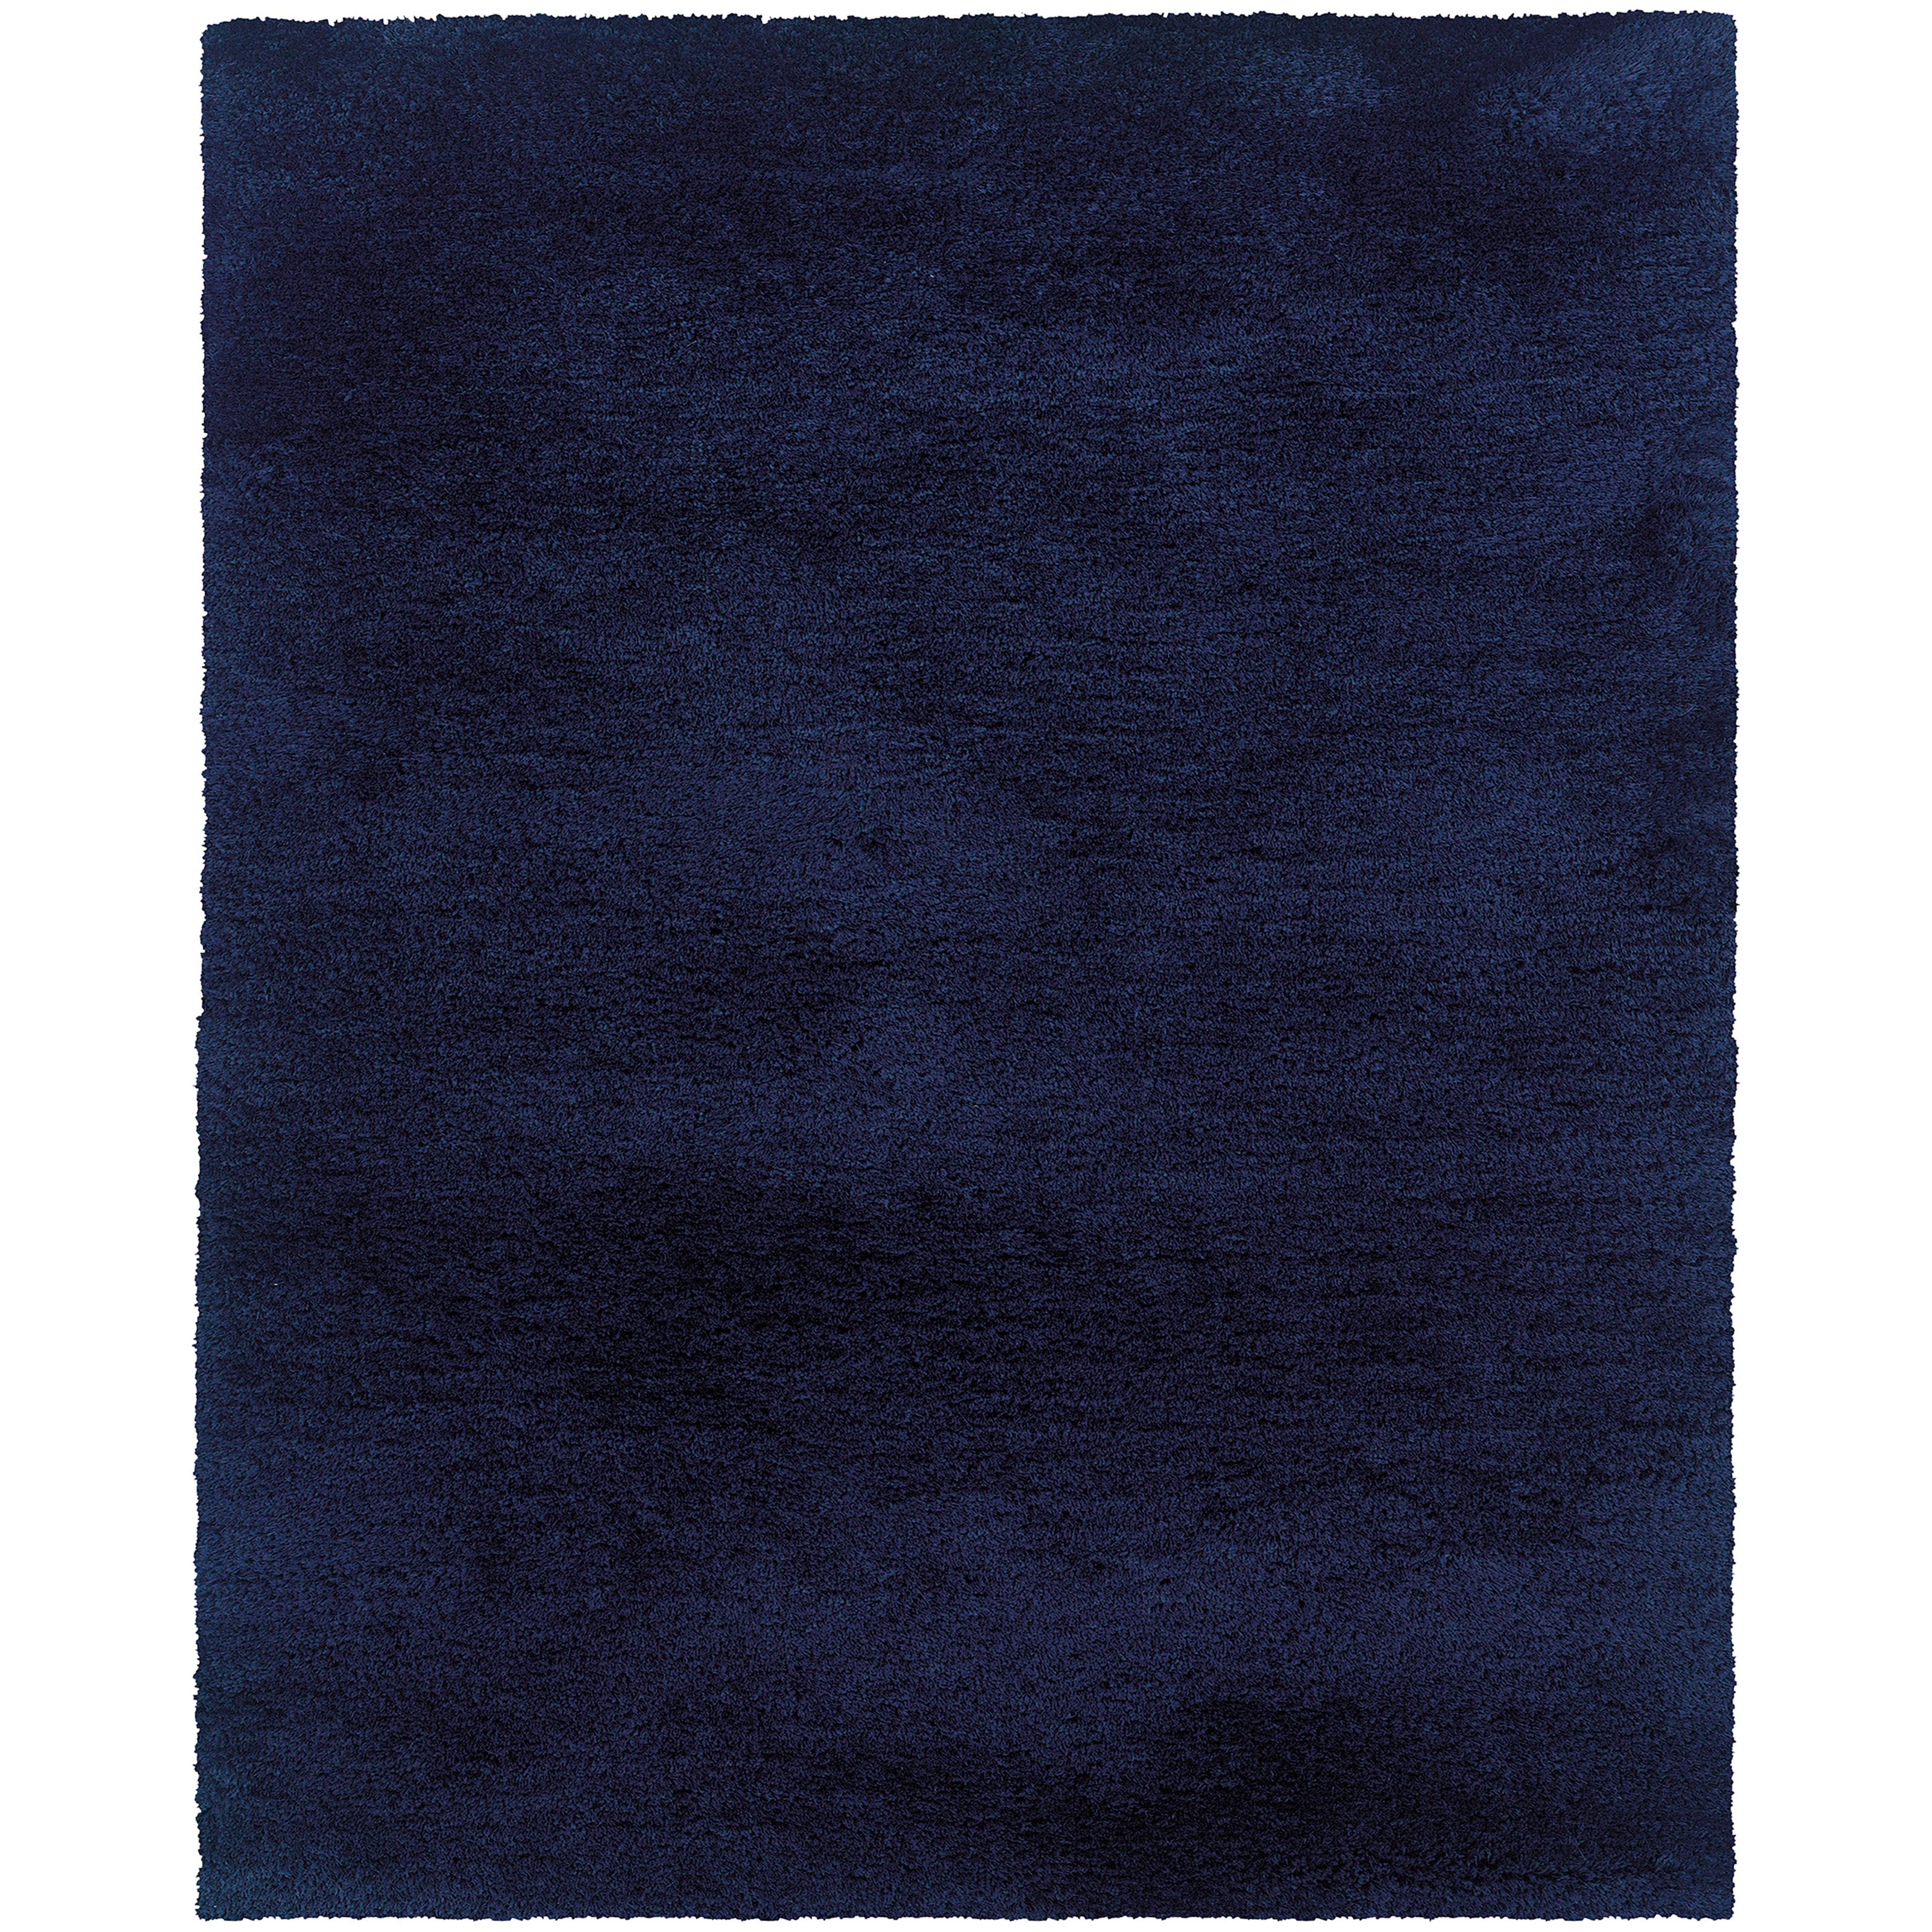 "Oriental Weavers Cosmo 8' 0"" X 11' 0"" Rug - Item Number: C81106244335ST"